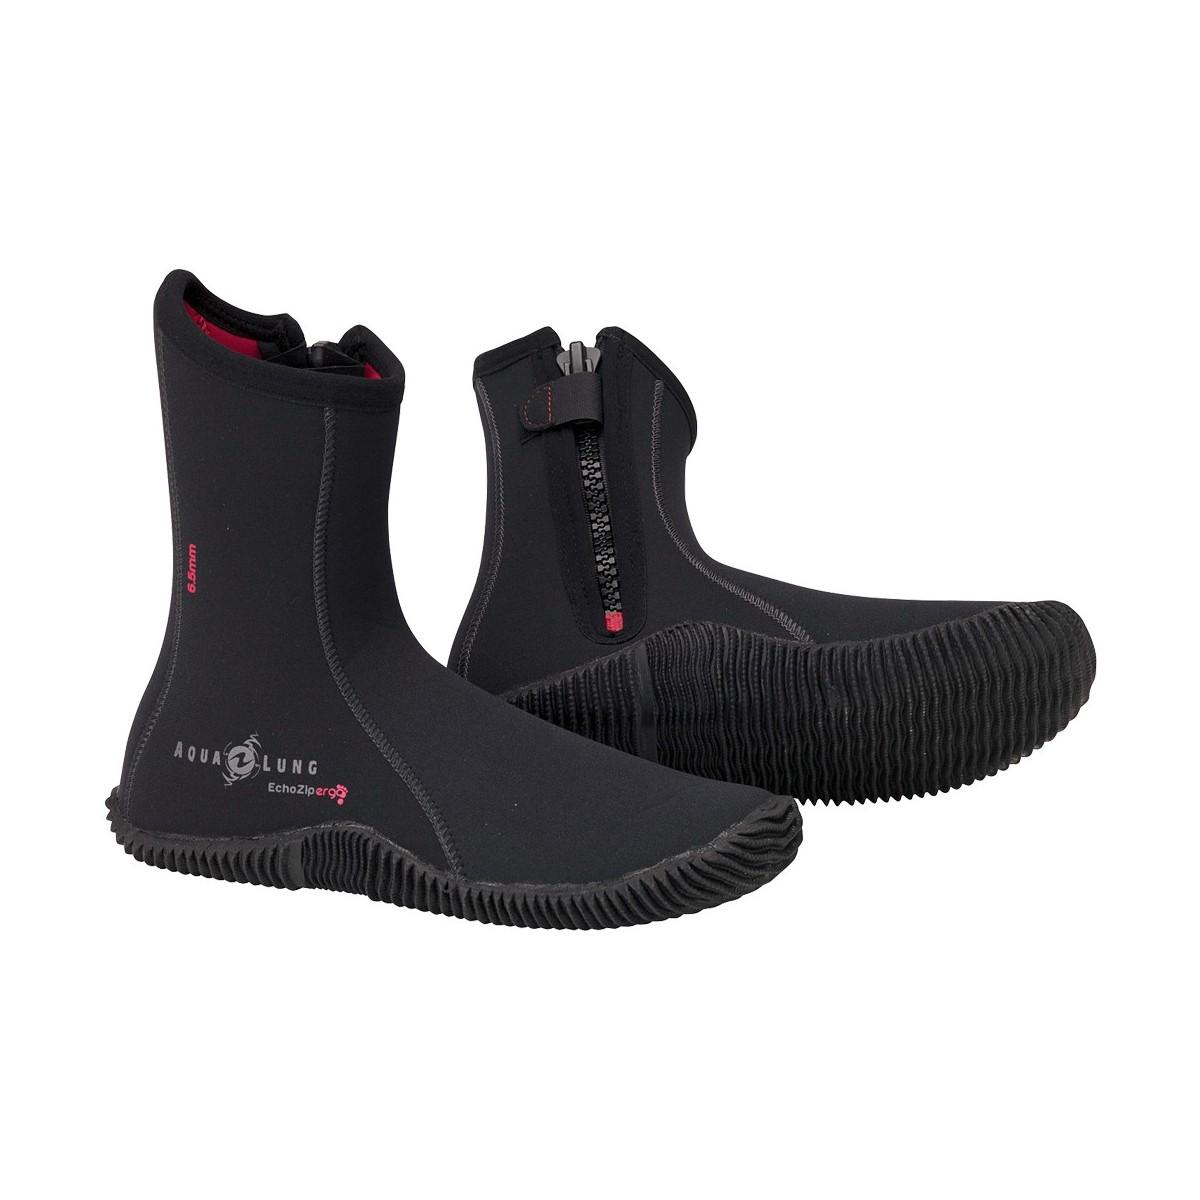 Aqua Lung Men's 5mm Echozip Ergo Boot